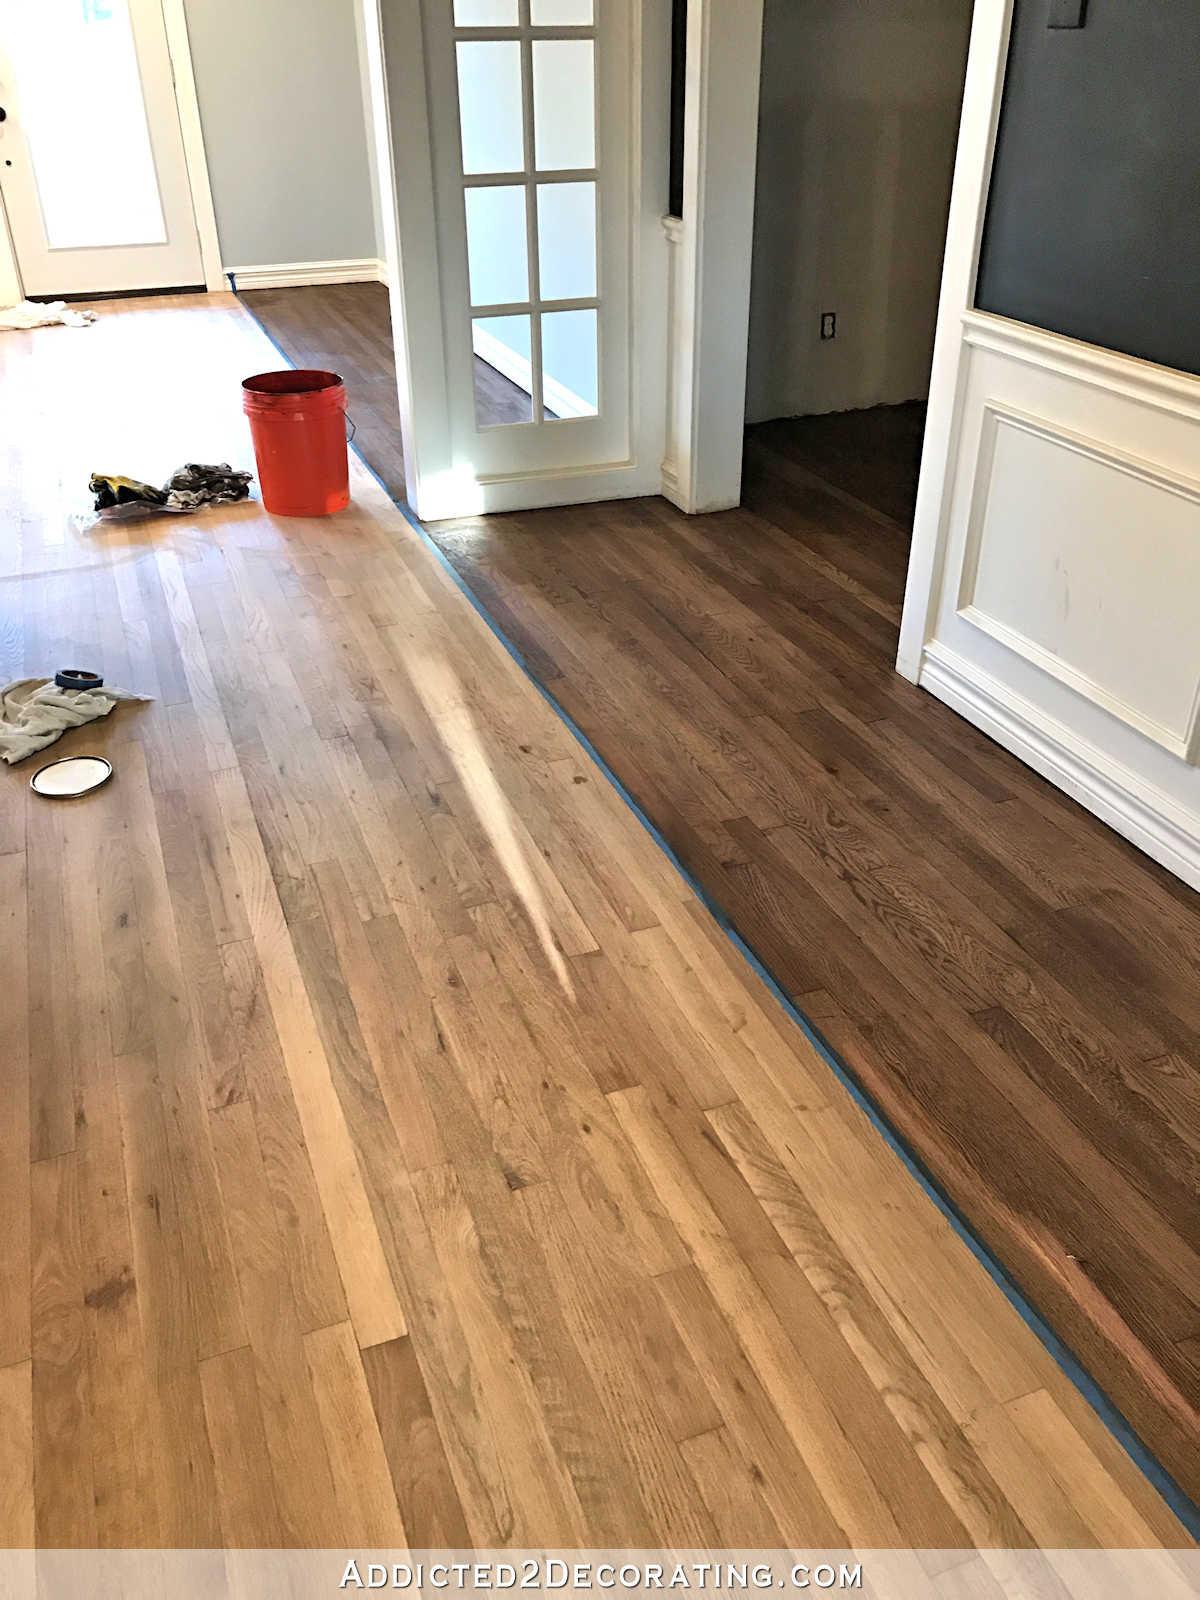 hardwood floor stain colors of 24 best of wood floor stain colors chart accroalamode with wood floor stain colors chart unique adventures in staining my red oak hardwood floors products